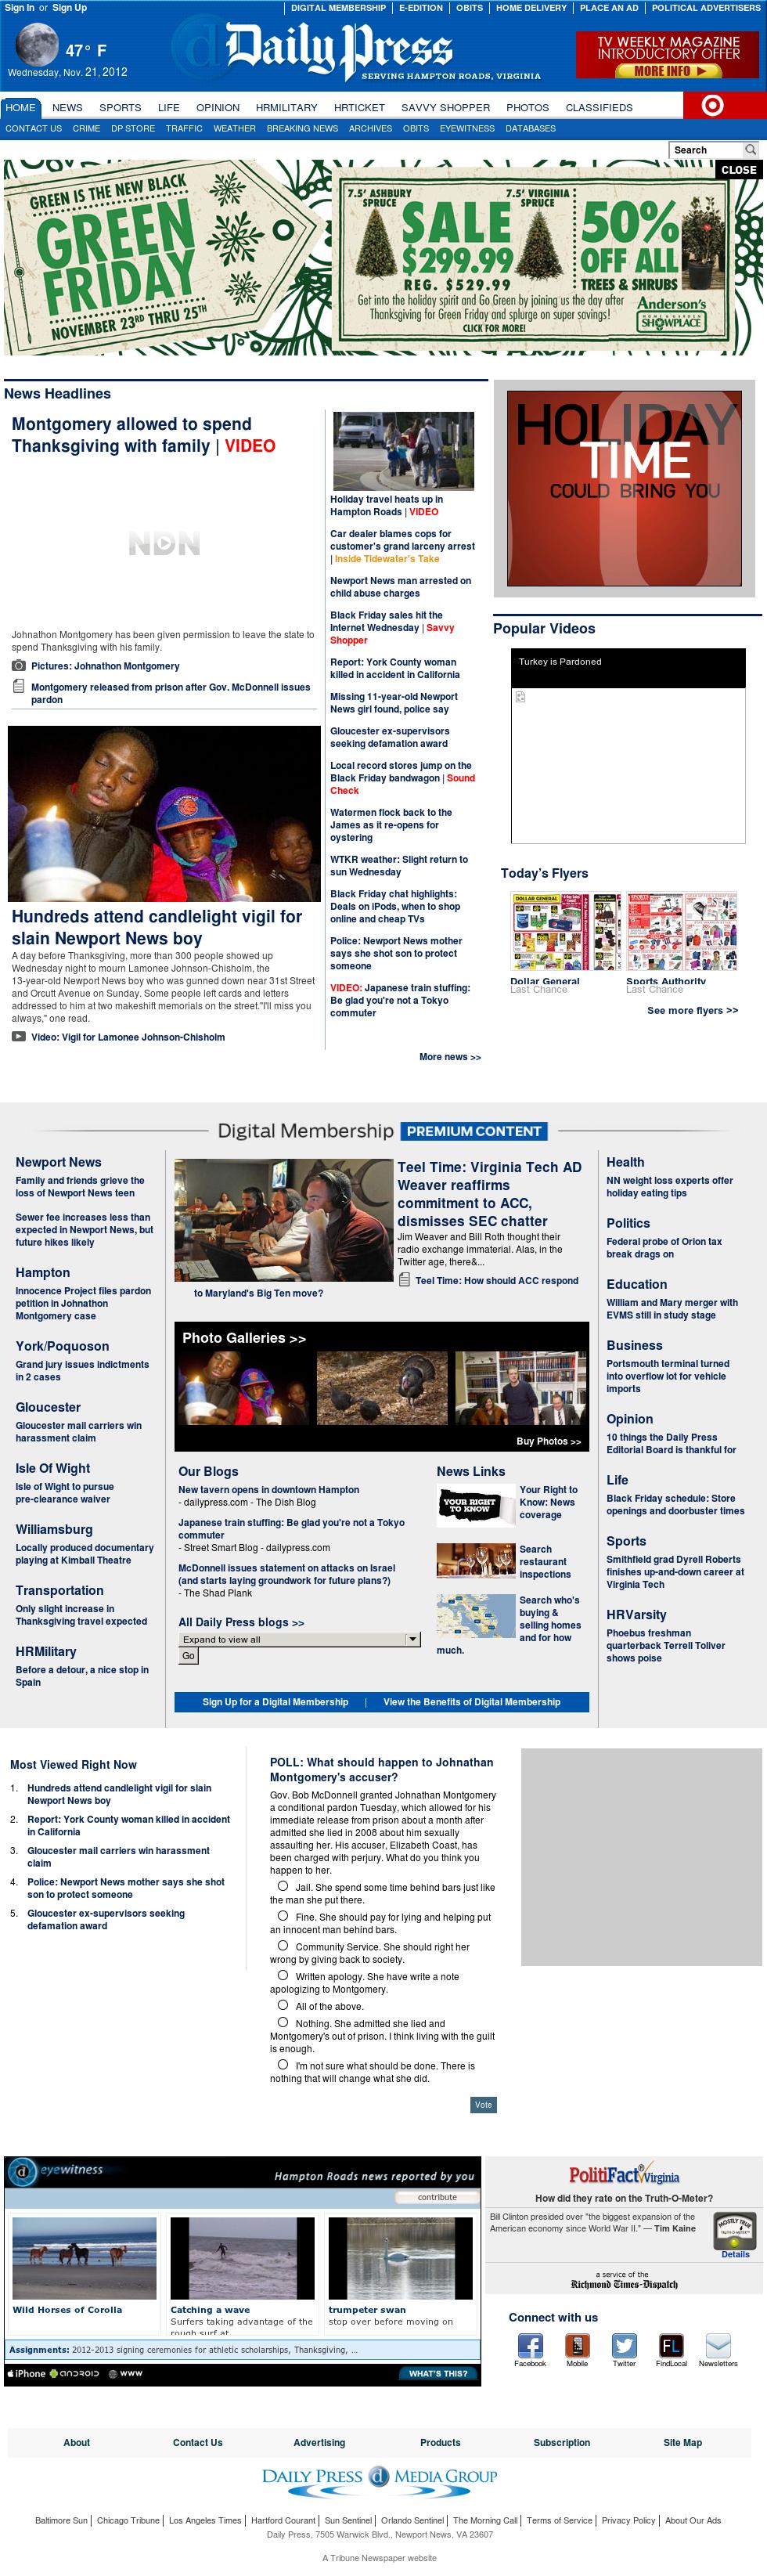 (Hampton Roads) Daily Press at Thursday Nov. 22, 2012, 5:06 a.m. UTC